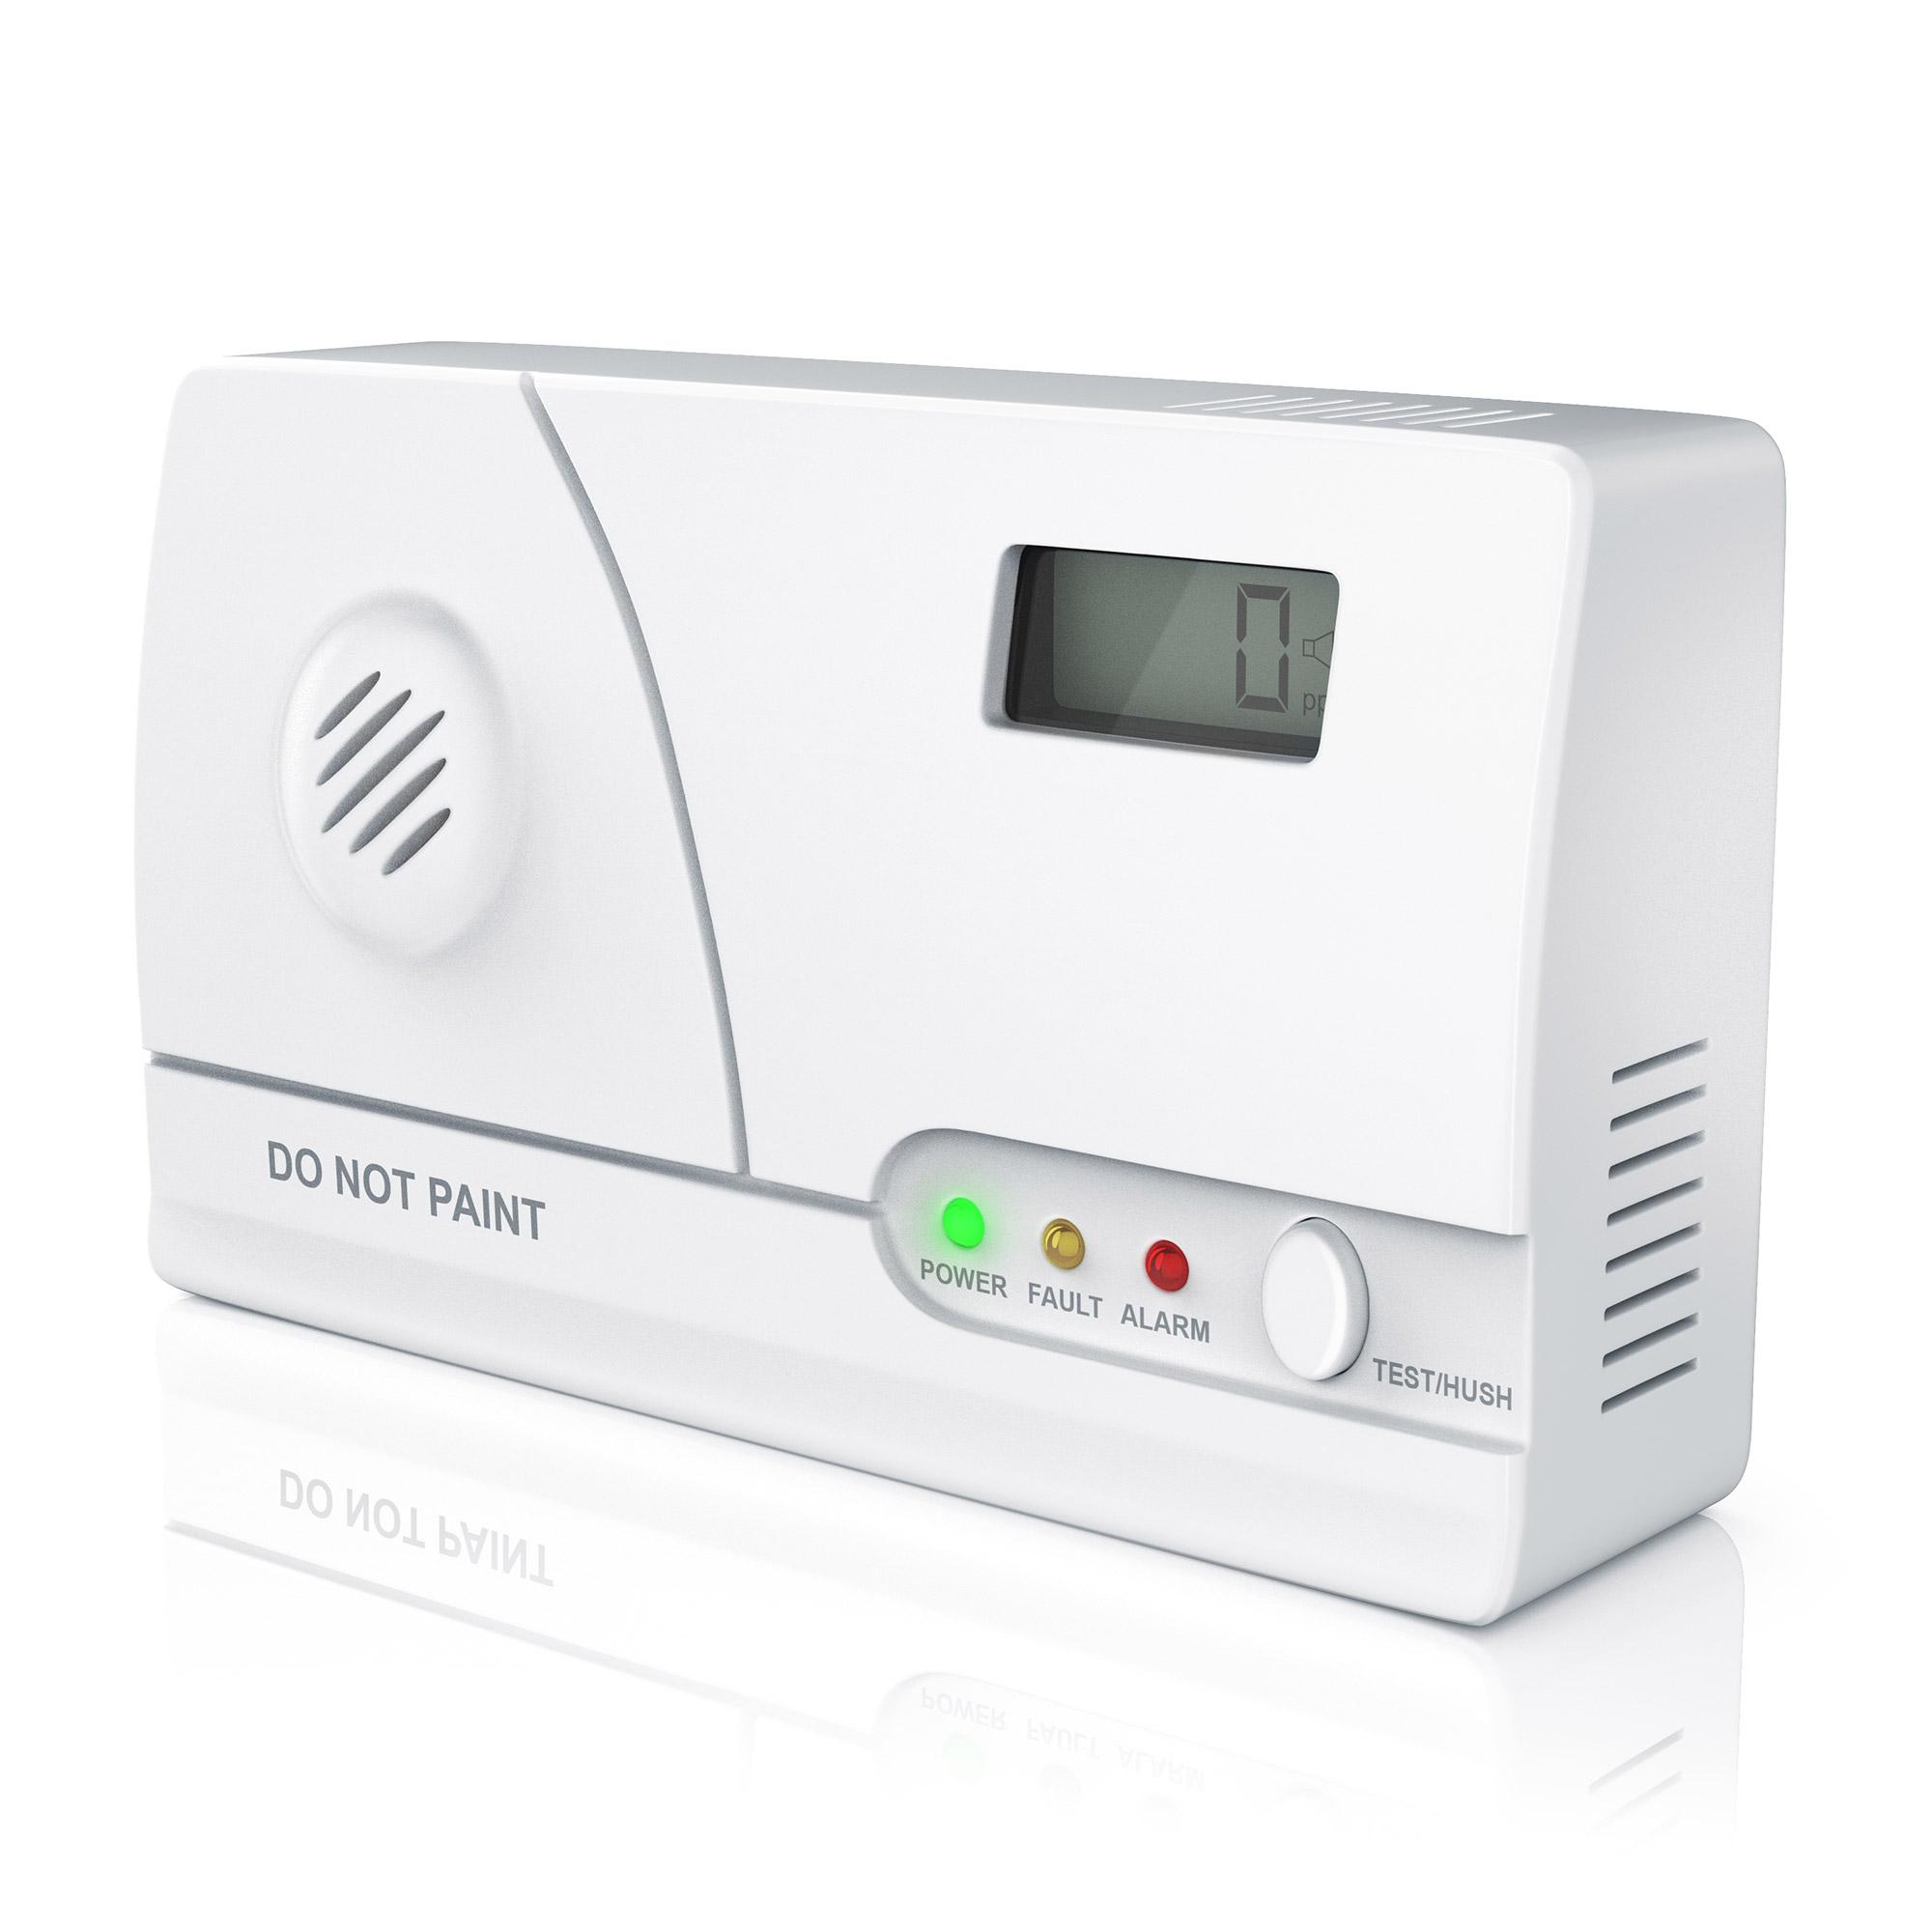 302601_Carbon-Monoxide-Detector_Galerie.jpg